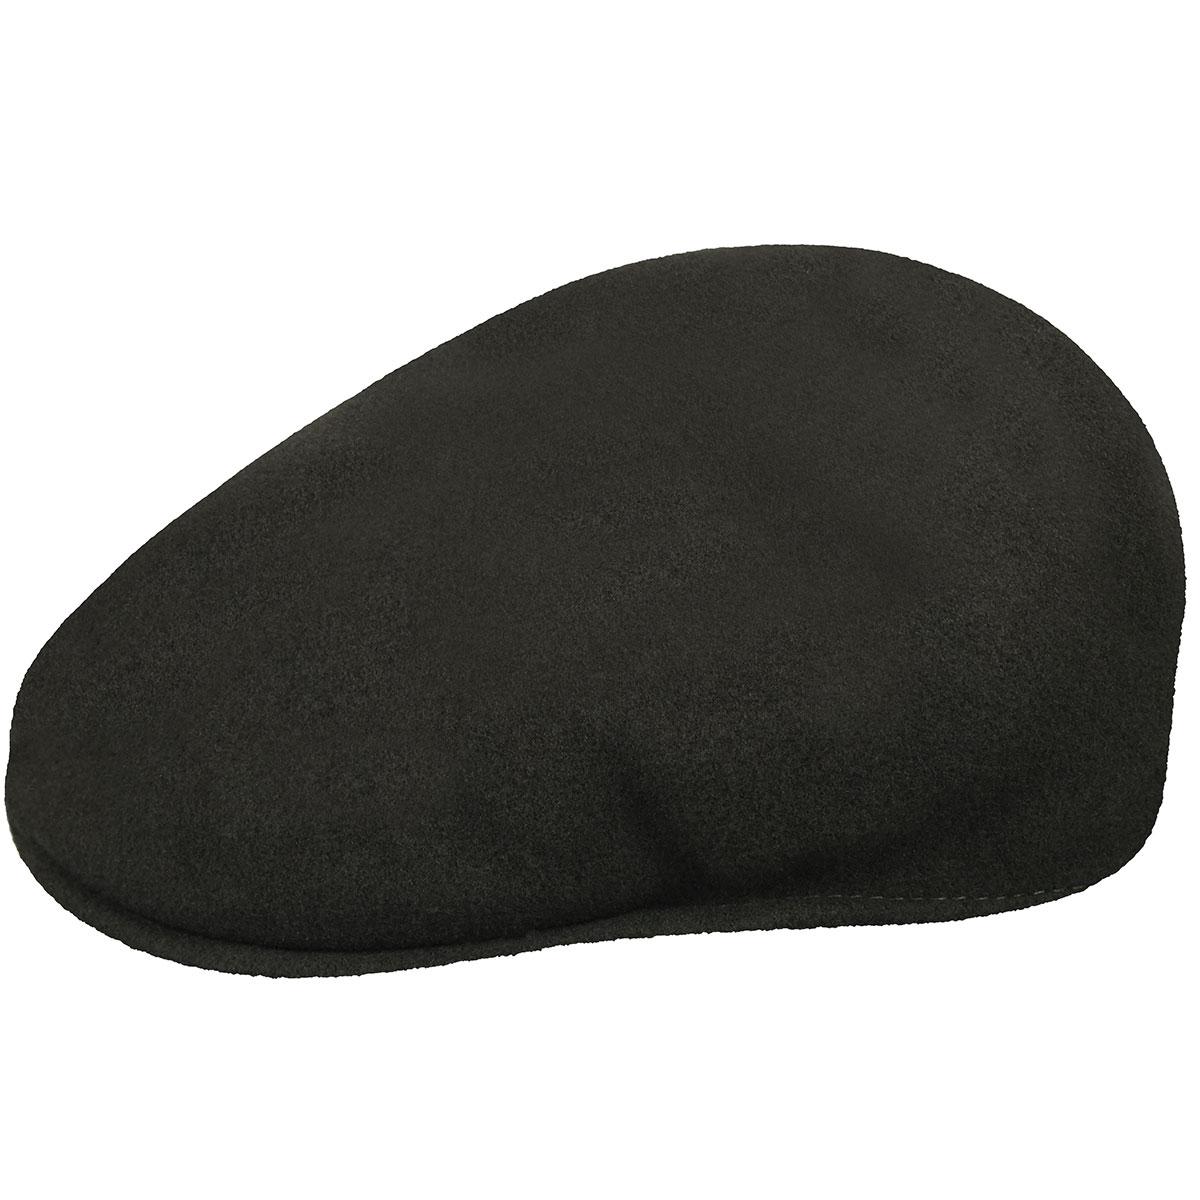 Kangol 504 Classic Wool Black Flatcap Cap 100/% Wool Men/'s Cap